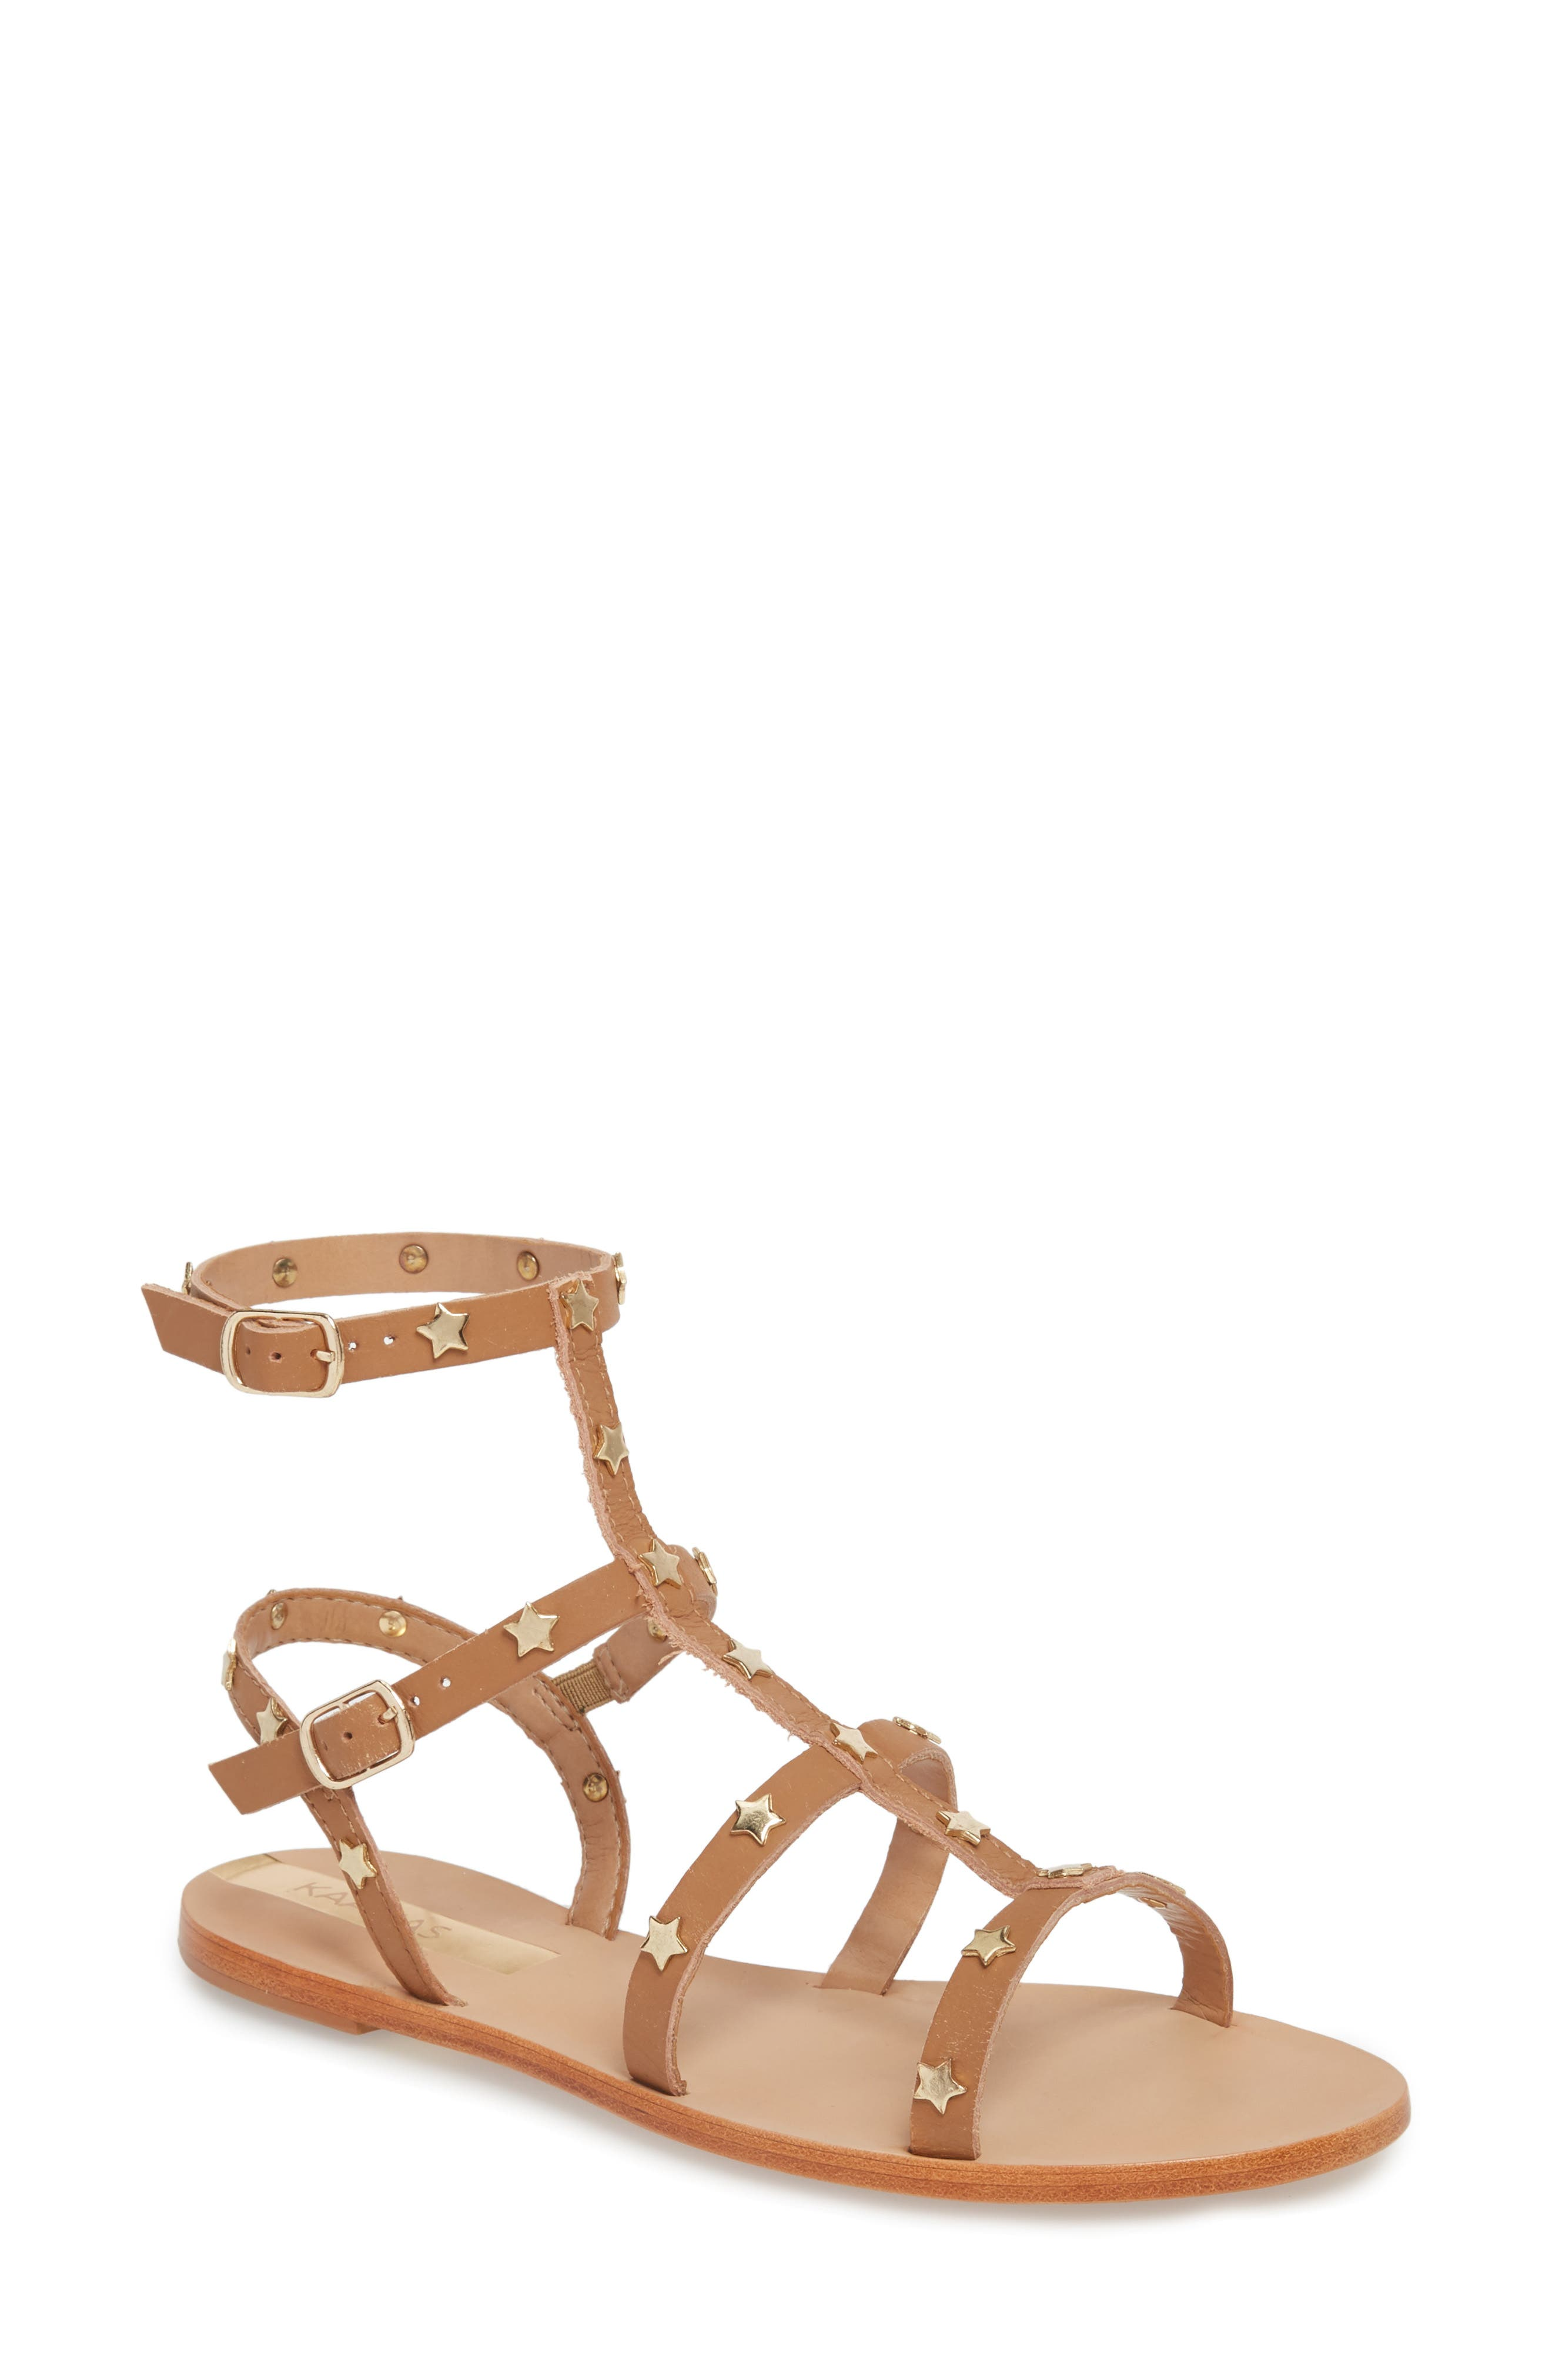 Lapa Gladiator Sandal,                         Main,                         color, Honey